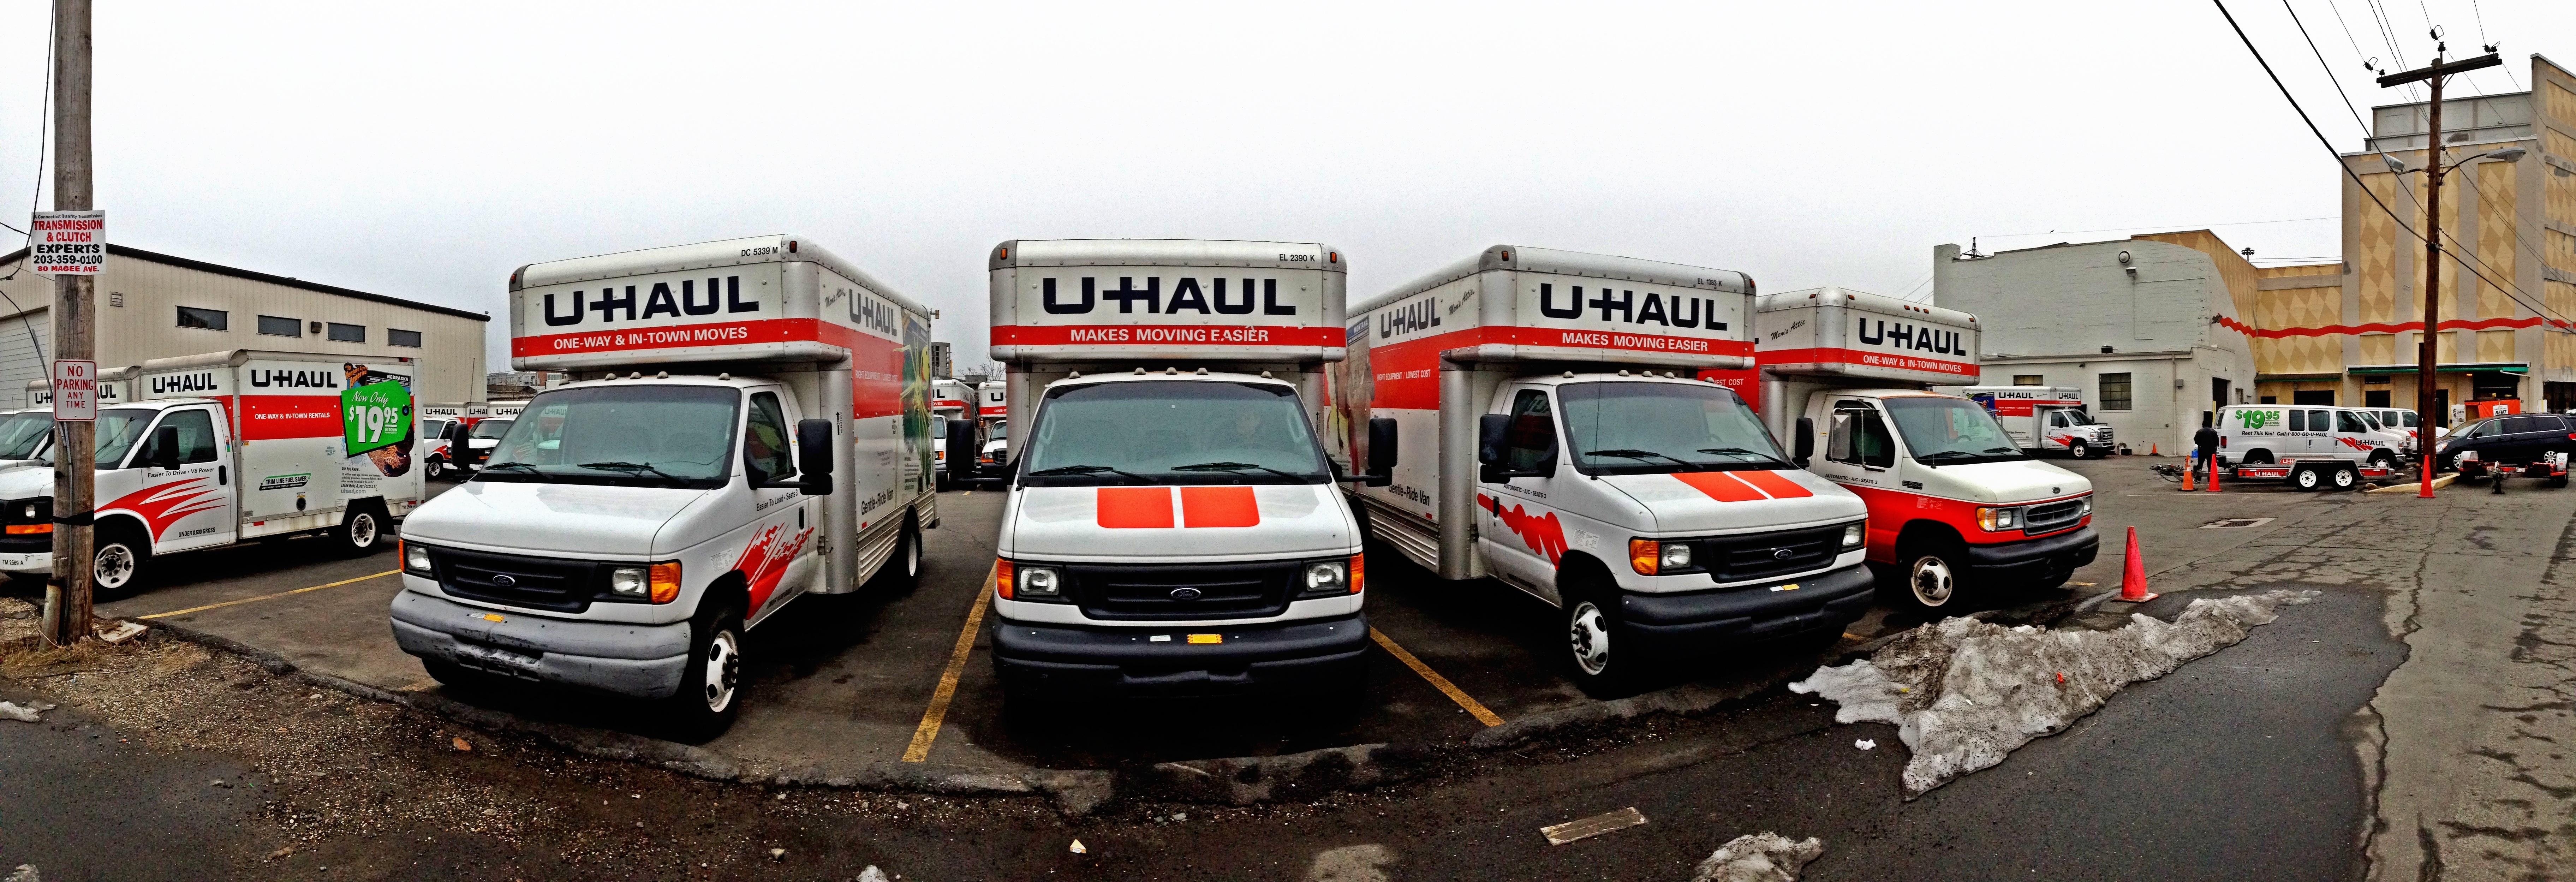 How To Use Uhaul Car Share